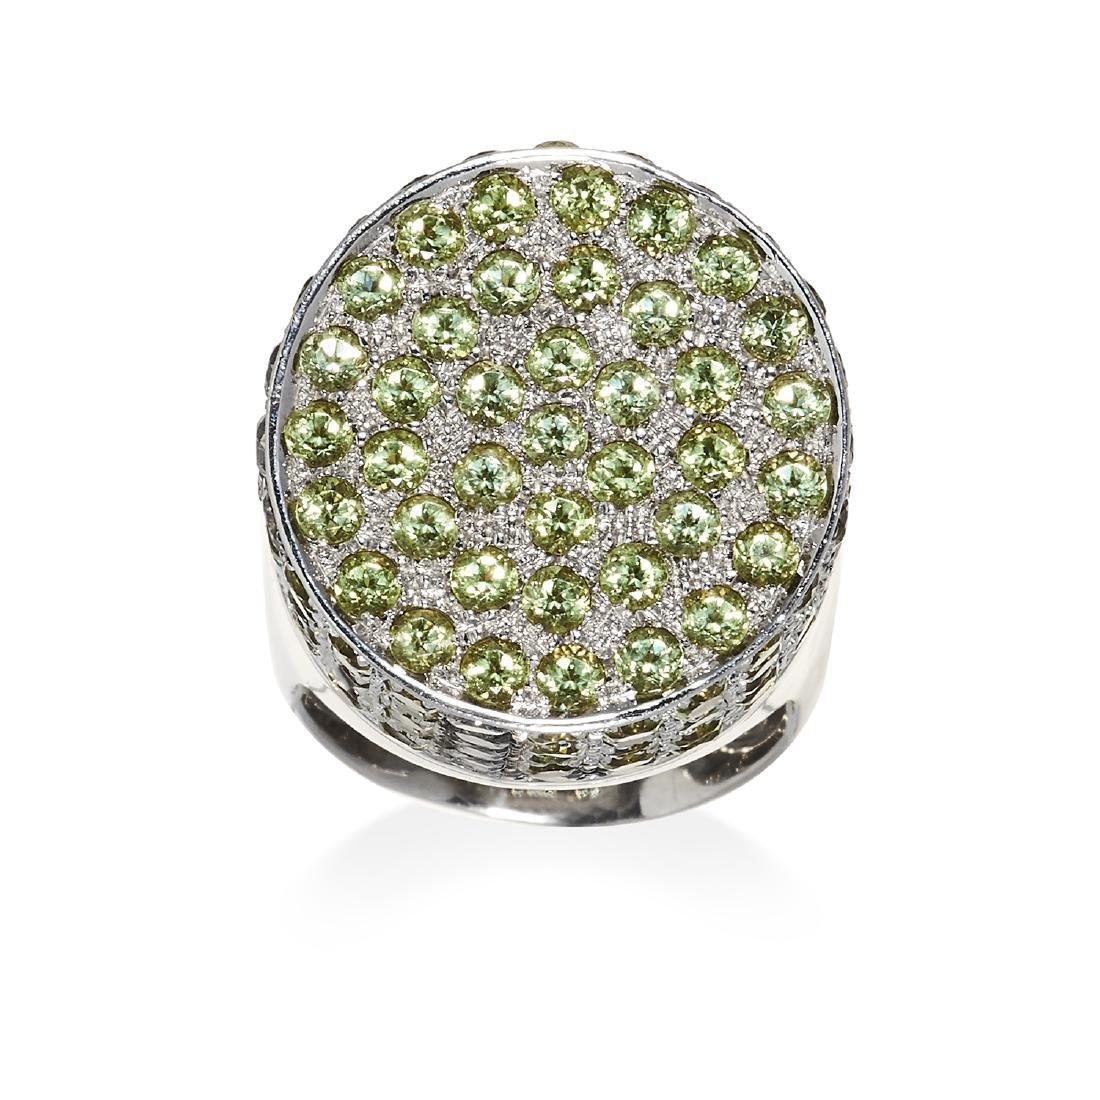 A PERIDOT AND DIAMOND LOVE RING, MONTEGA in 18ct white